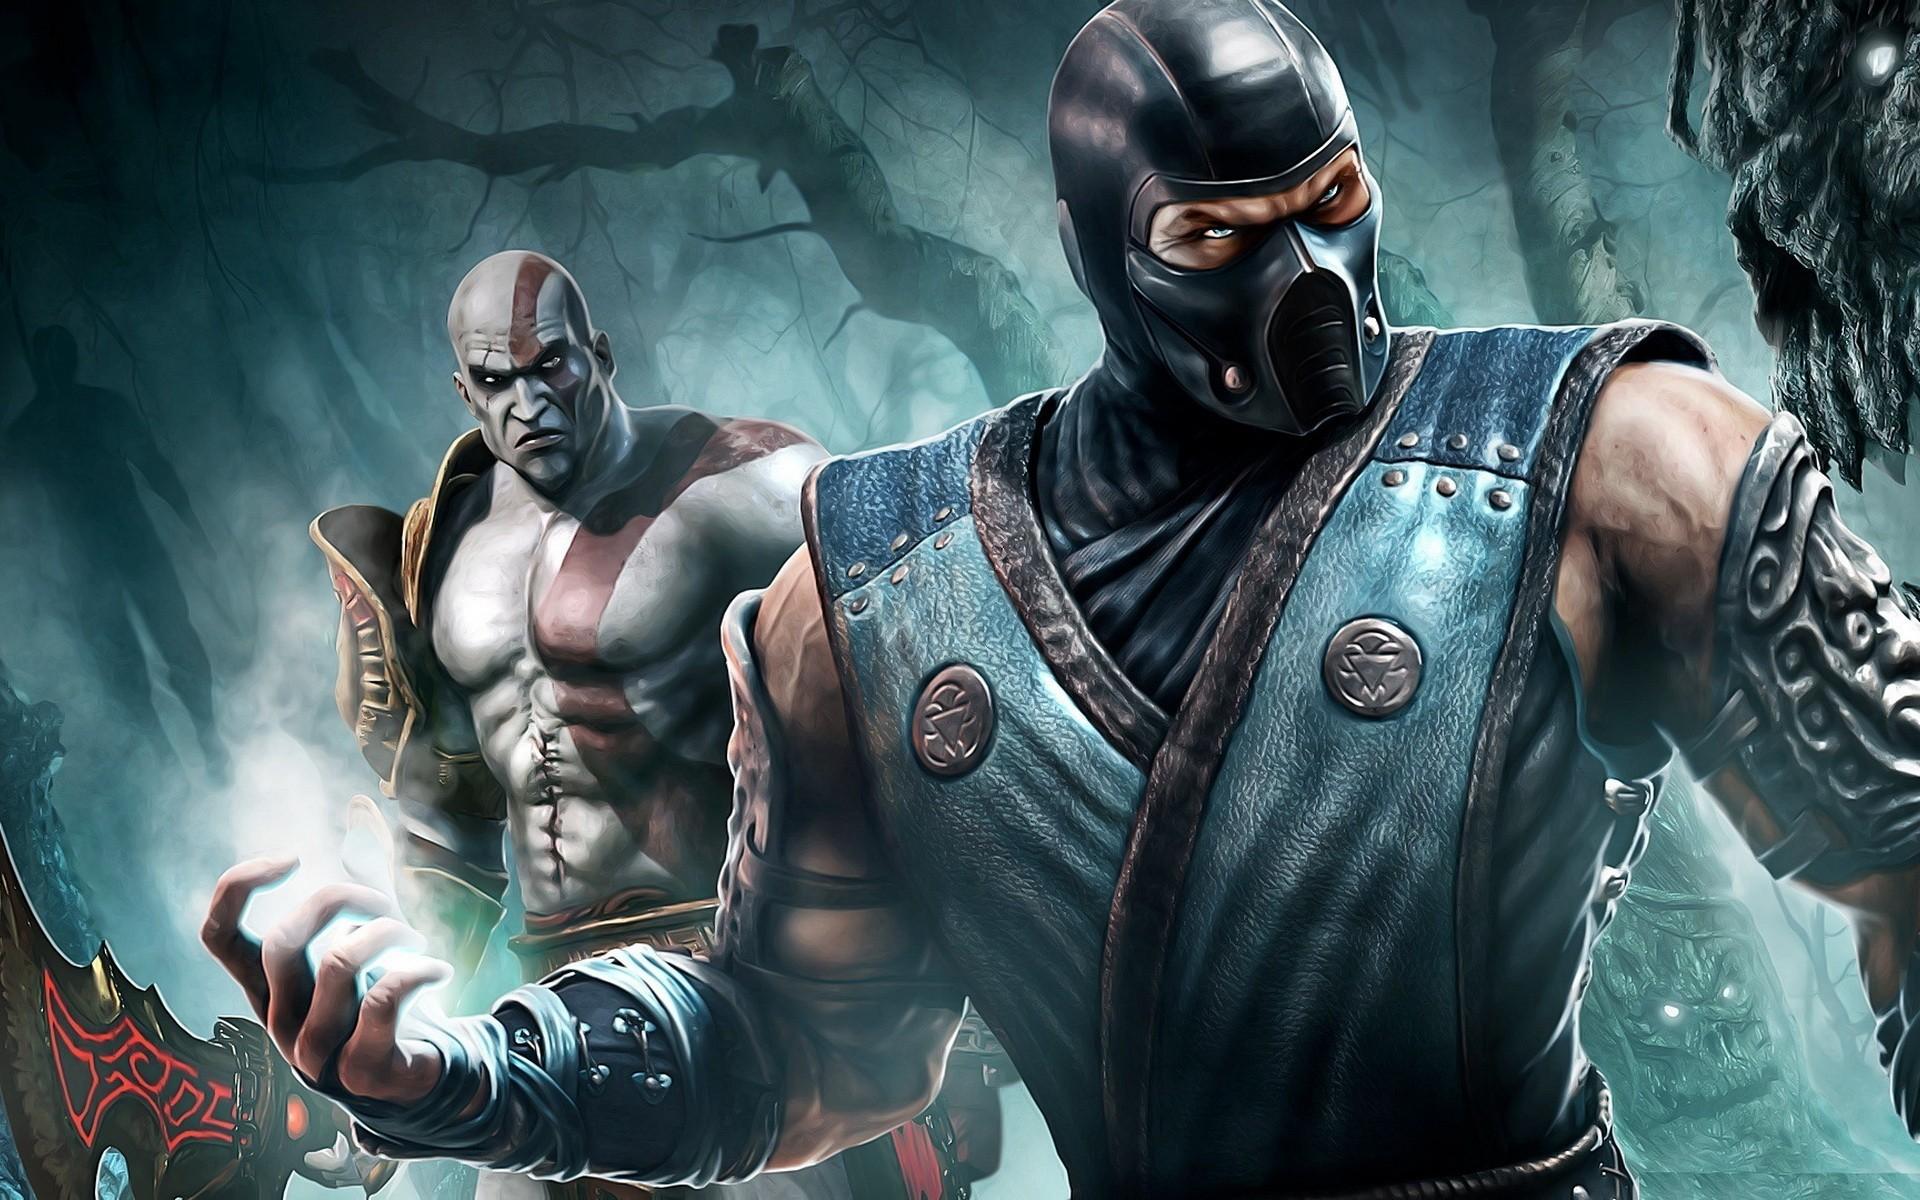 Video Games Wallpaper 1920x1200 Video Games Mortal Kombat Games 1920x1200